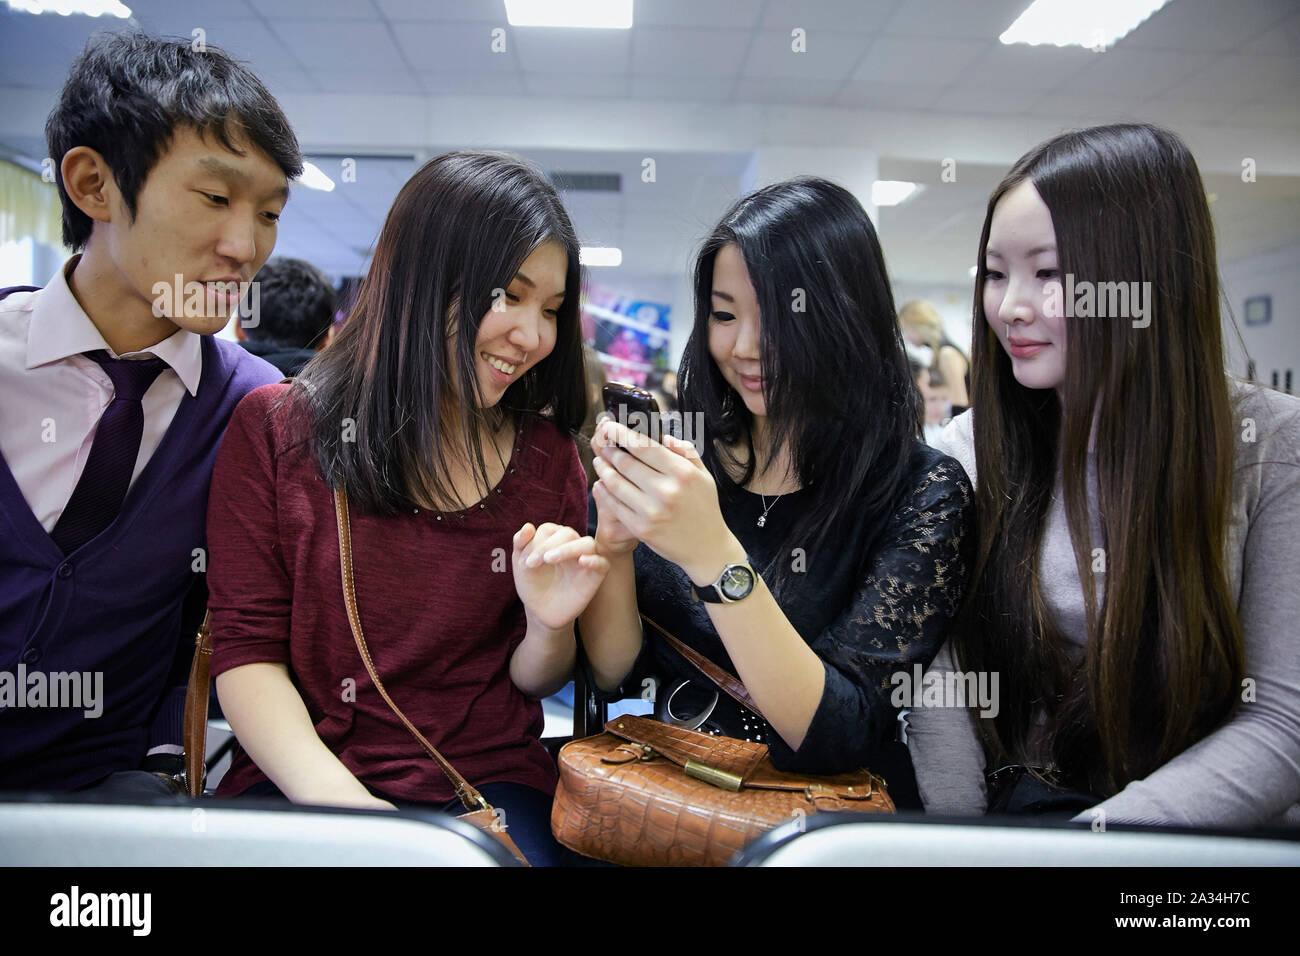 Russia Yakutsk students with there mobile phones 1-02-2013 photo: Jaco Klamer Stock Photo